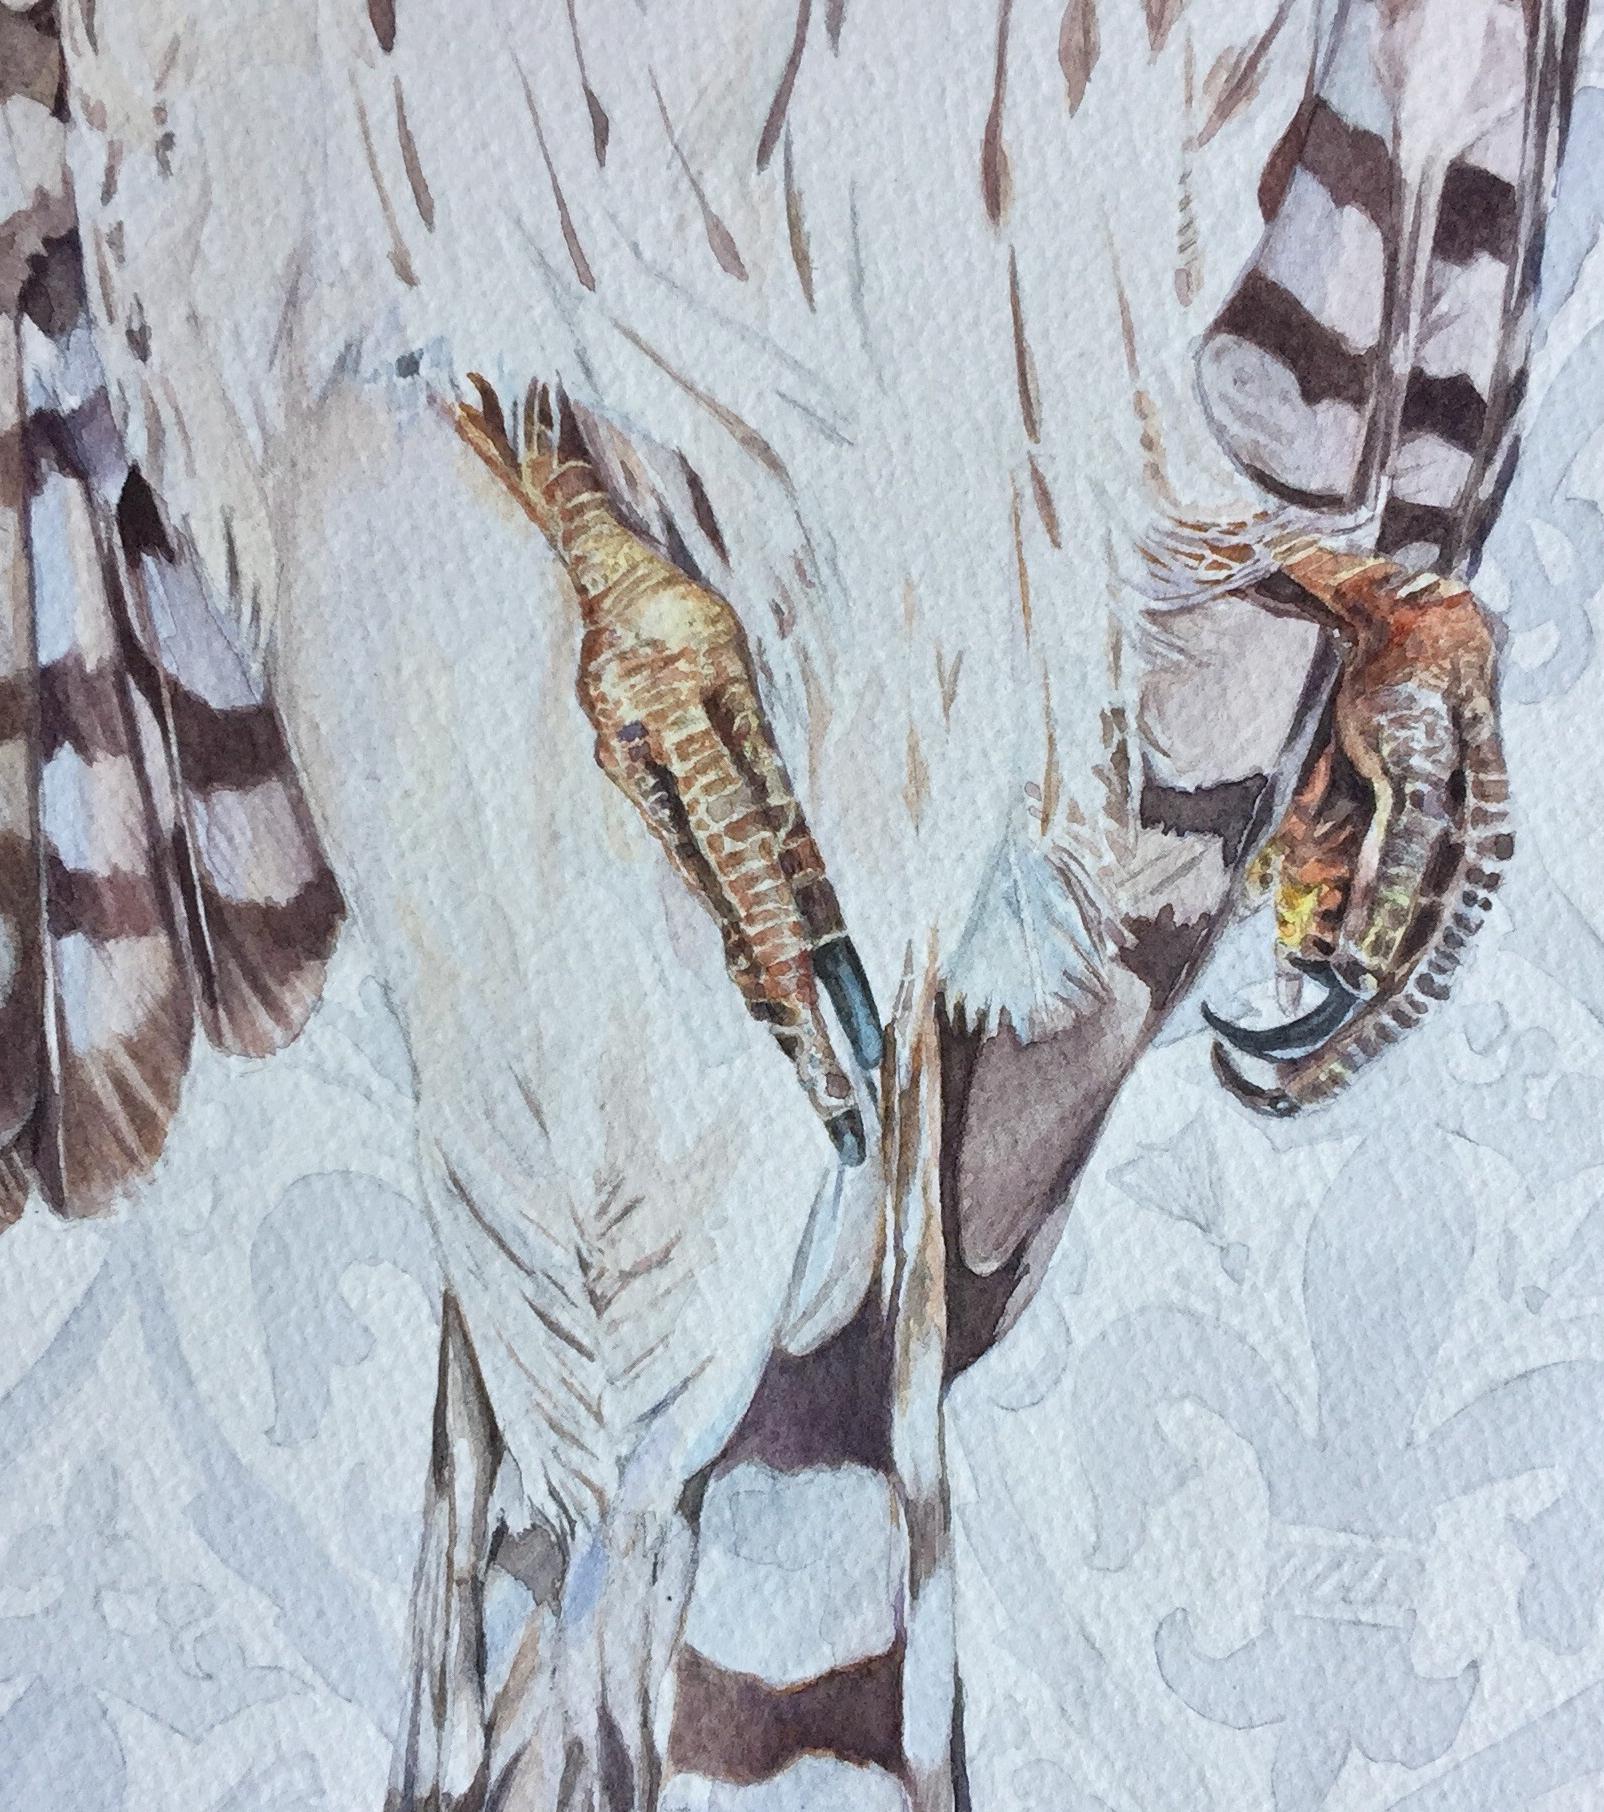 Detail of Marauder